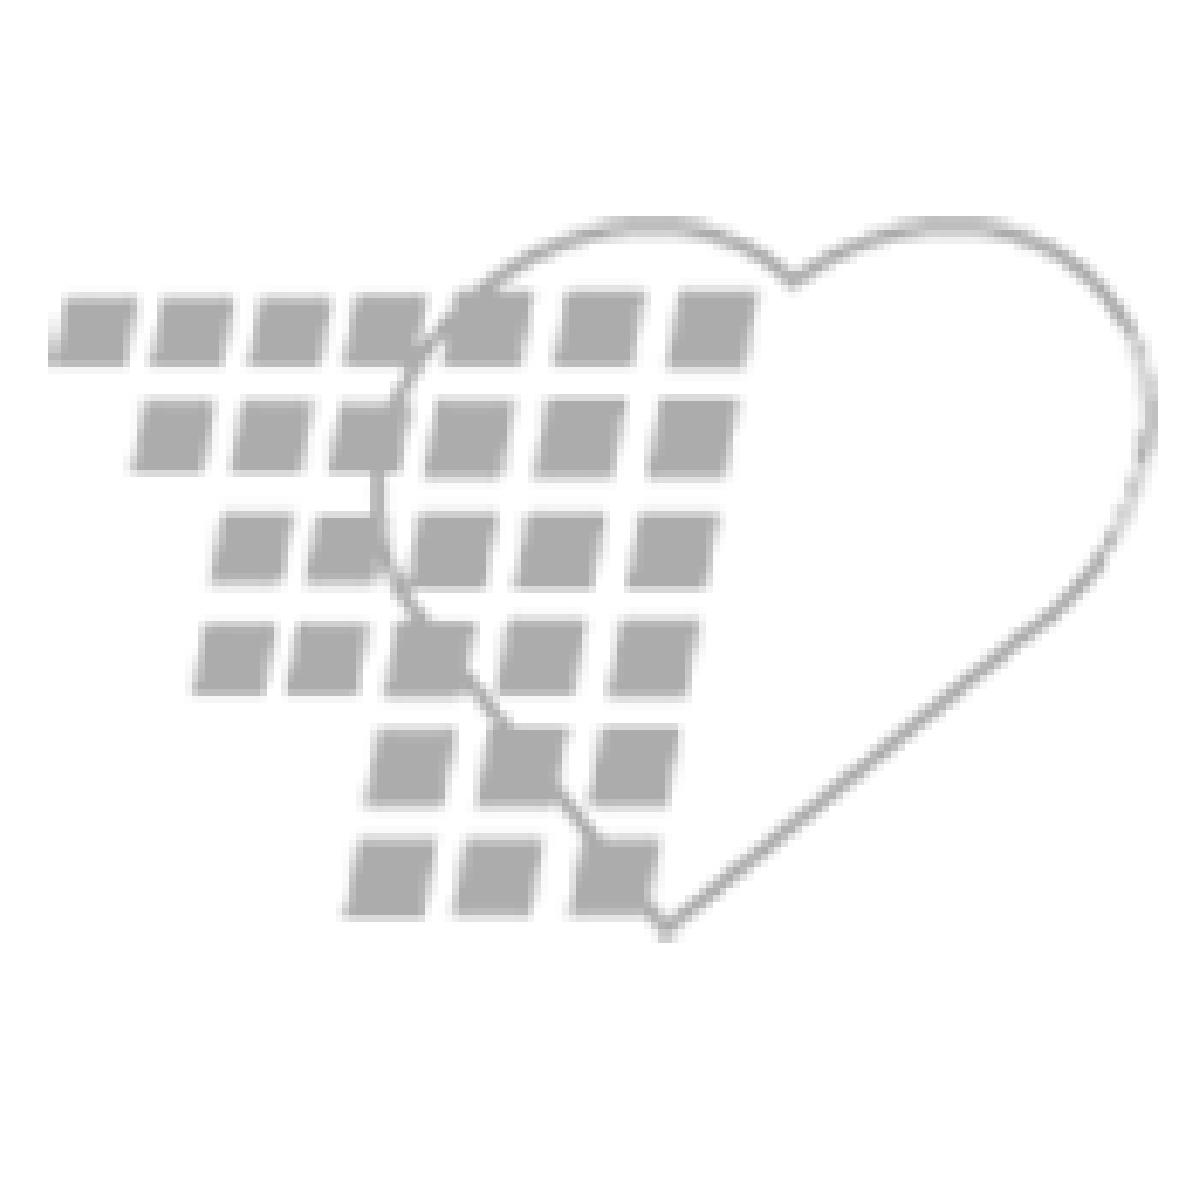 02-43-7102 Disposable ECG Snap Electrodes - Adult 4/Pouch